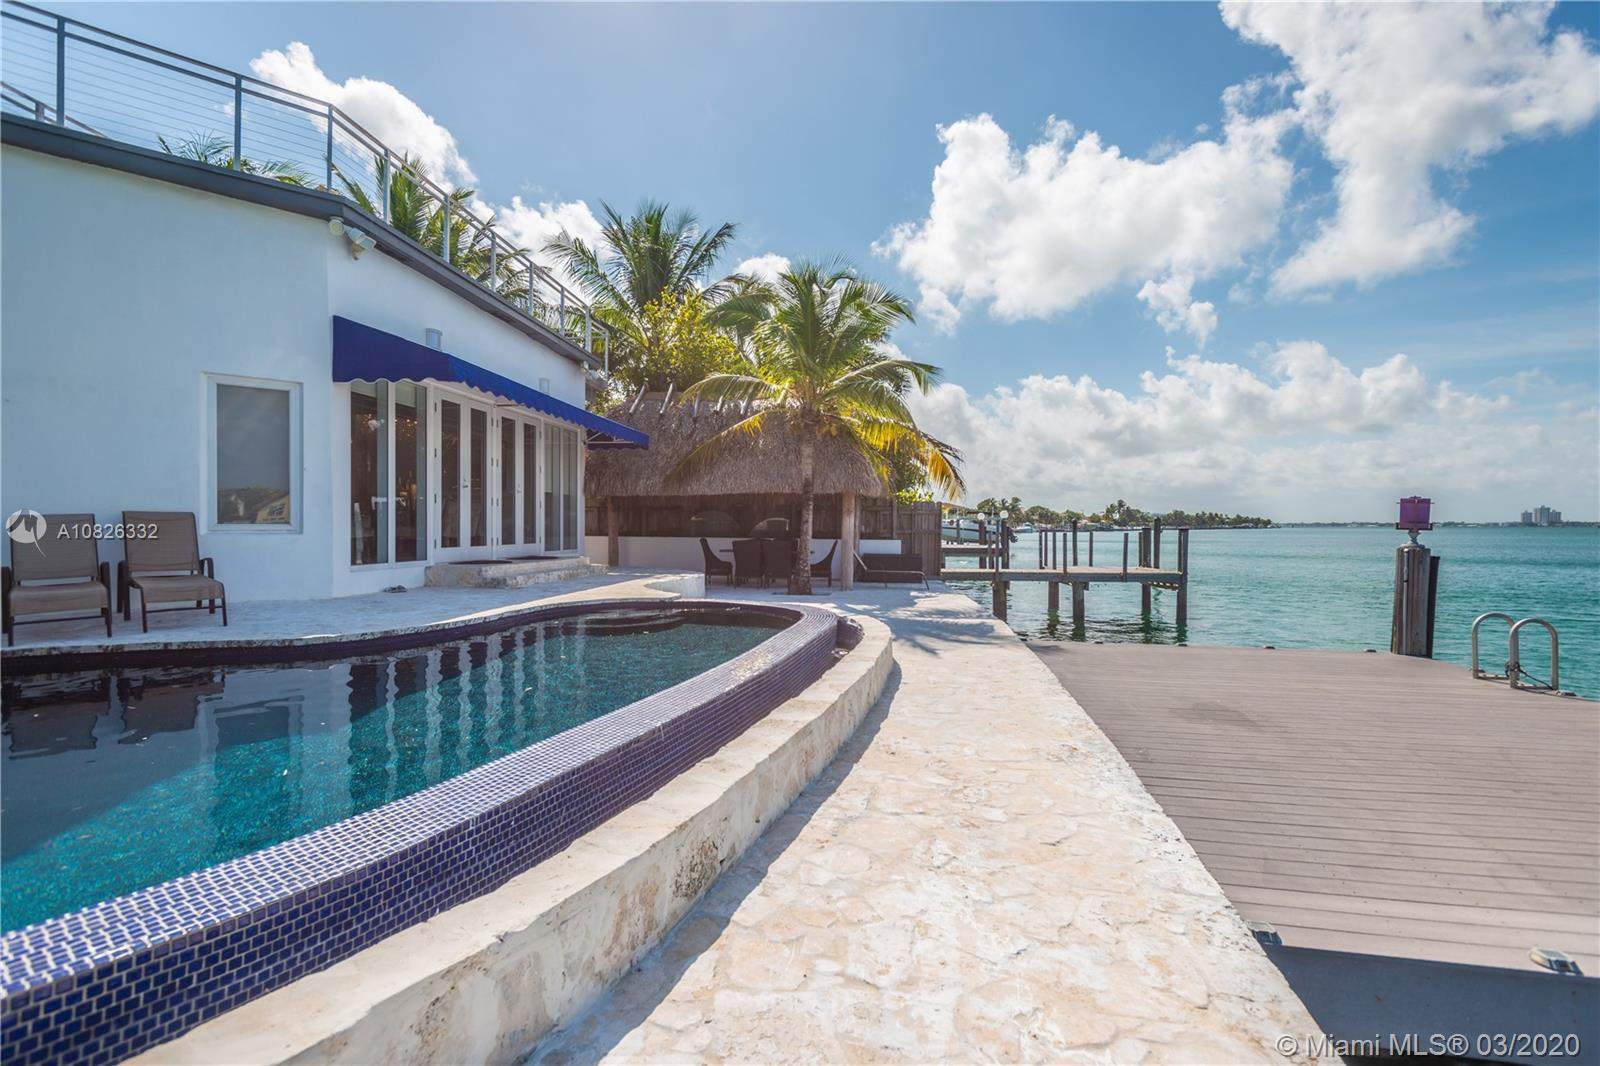 853 86 St, Miami Beach, FL 33141 - Miami Beach, FL real estate listing